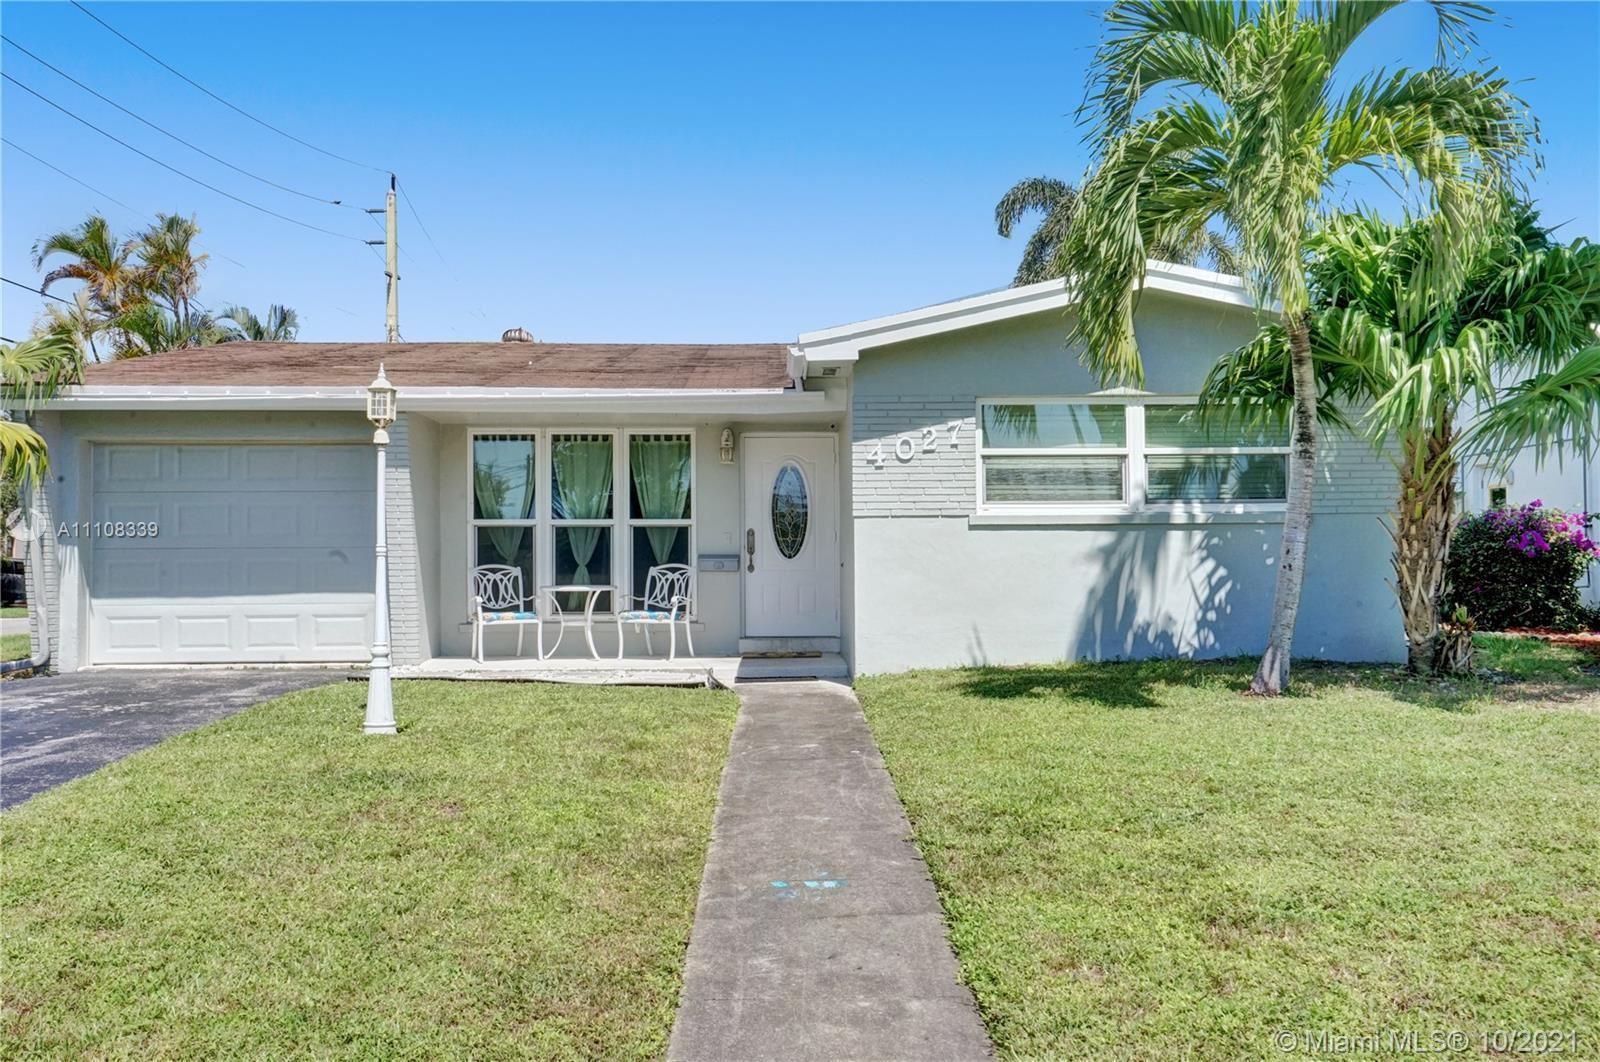 4027 Lincoln St, Hollywood, FL 33021 - #: A11108339